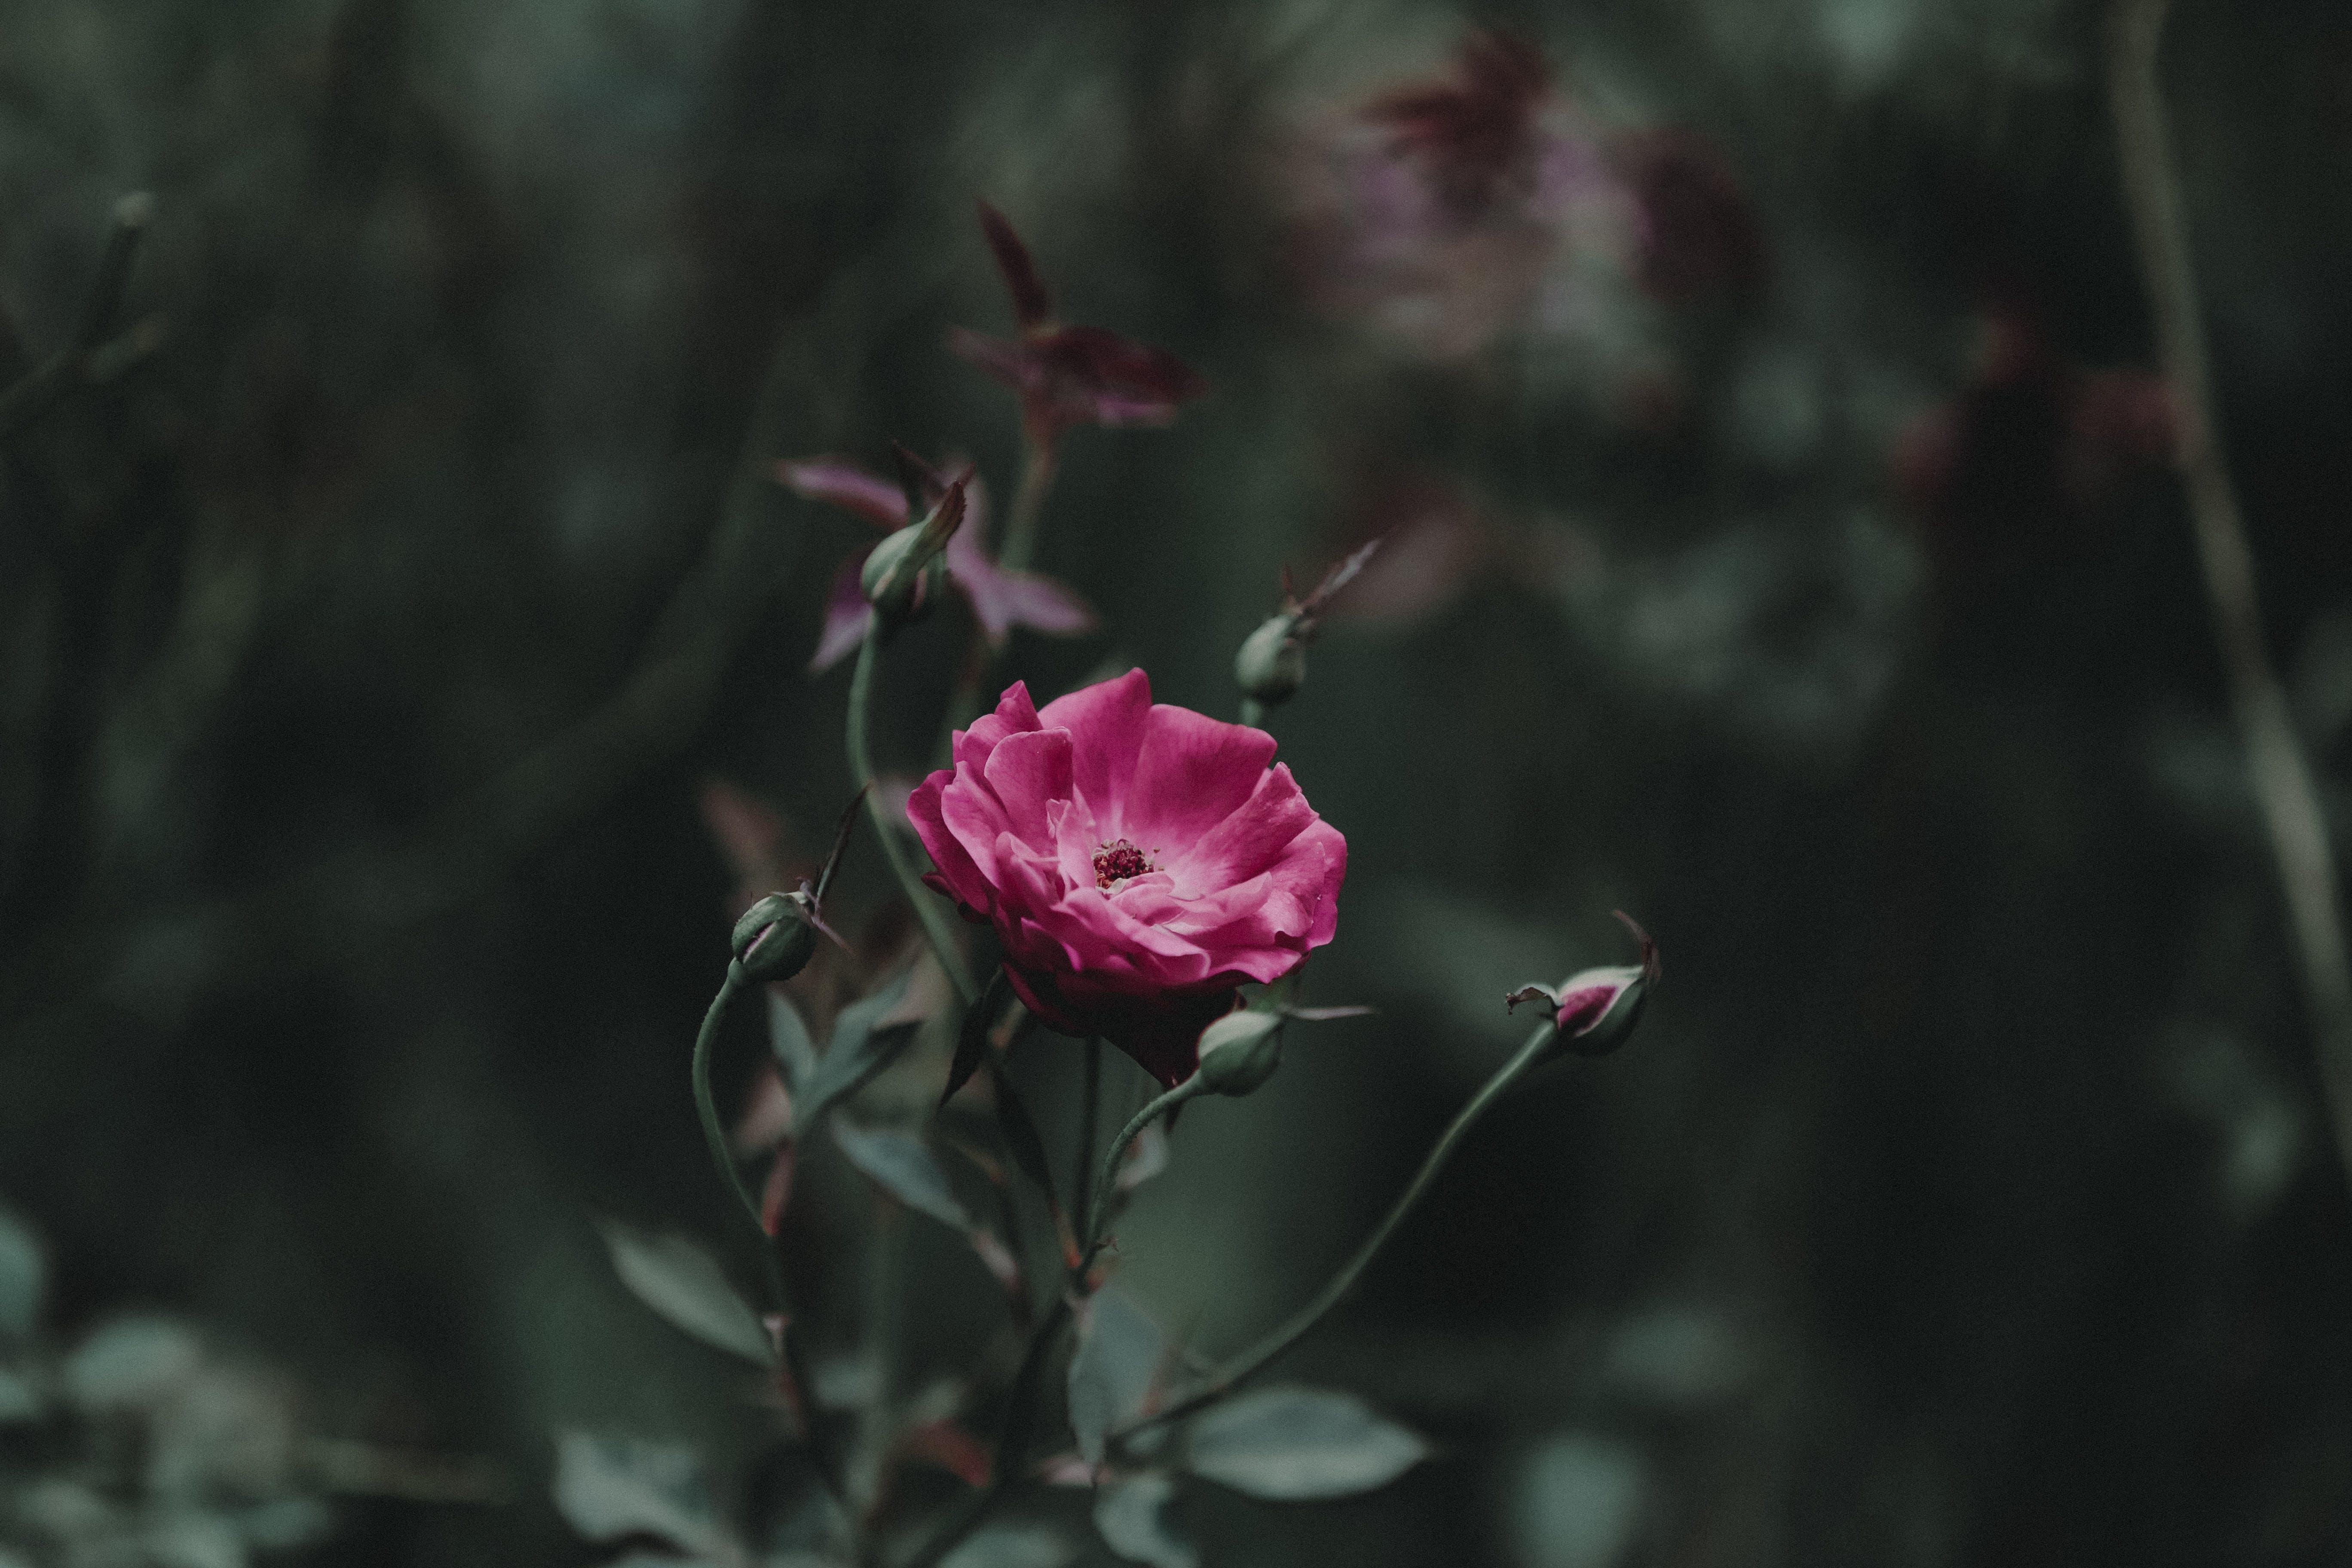 Shallow Focus Photography of Pink Petal Flower